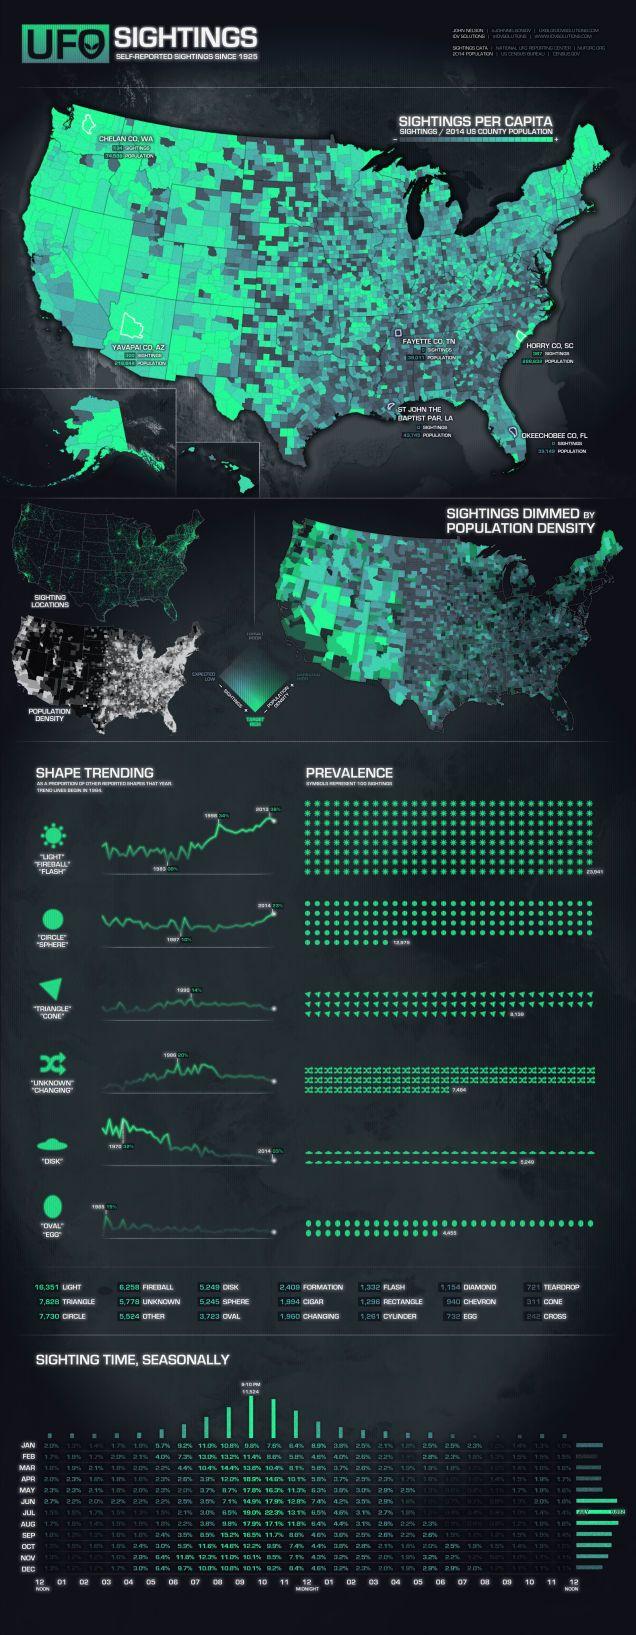 UFO発見報告マップが凄い!#未確認飛行物体 #宇宙人 #未知との遭遇 #エイリアン http://japa.la/?p=50342